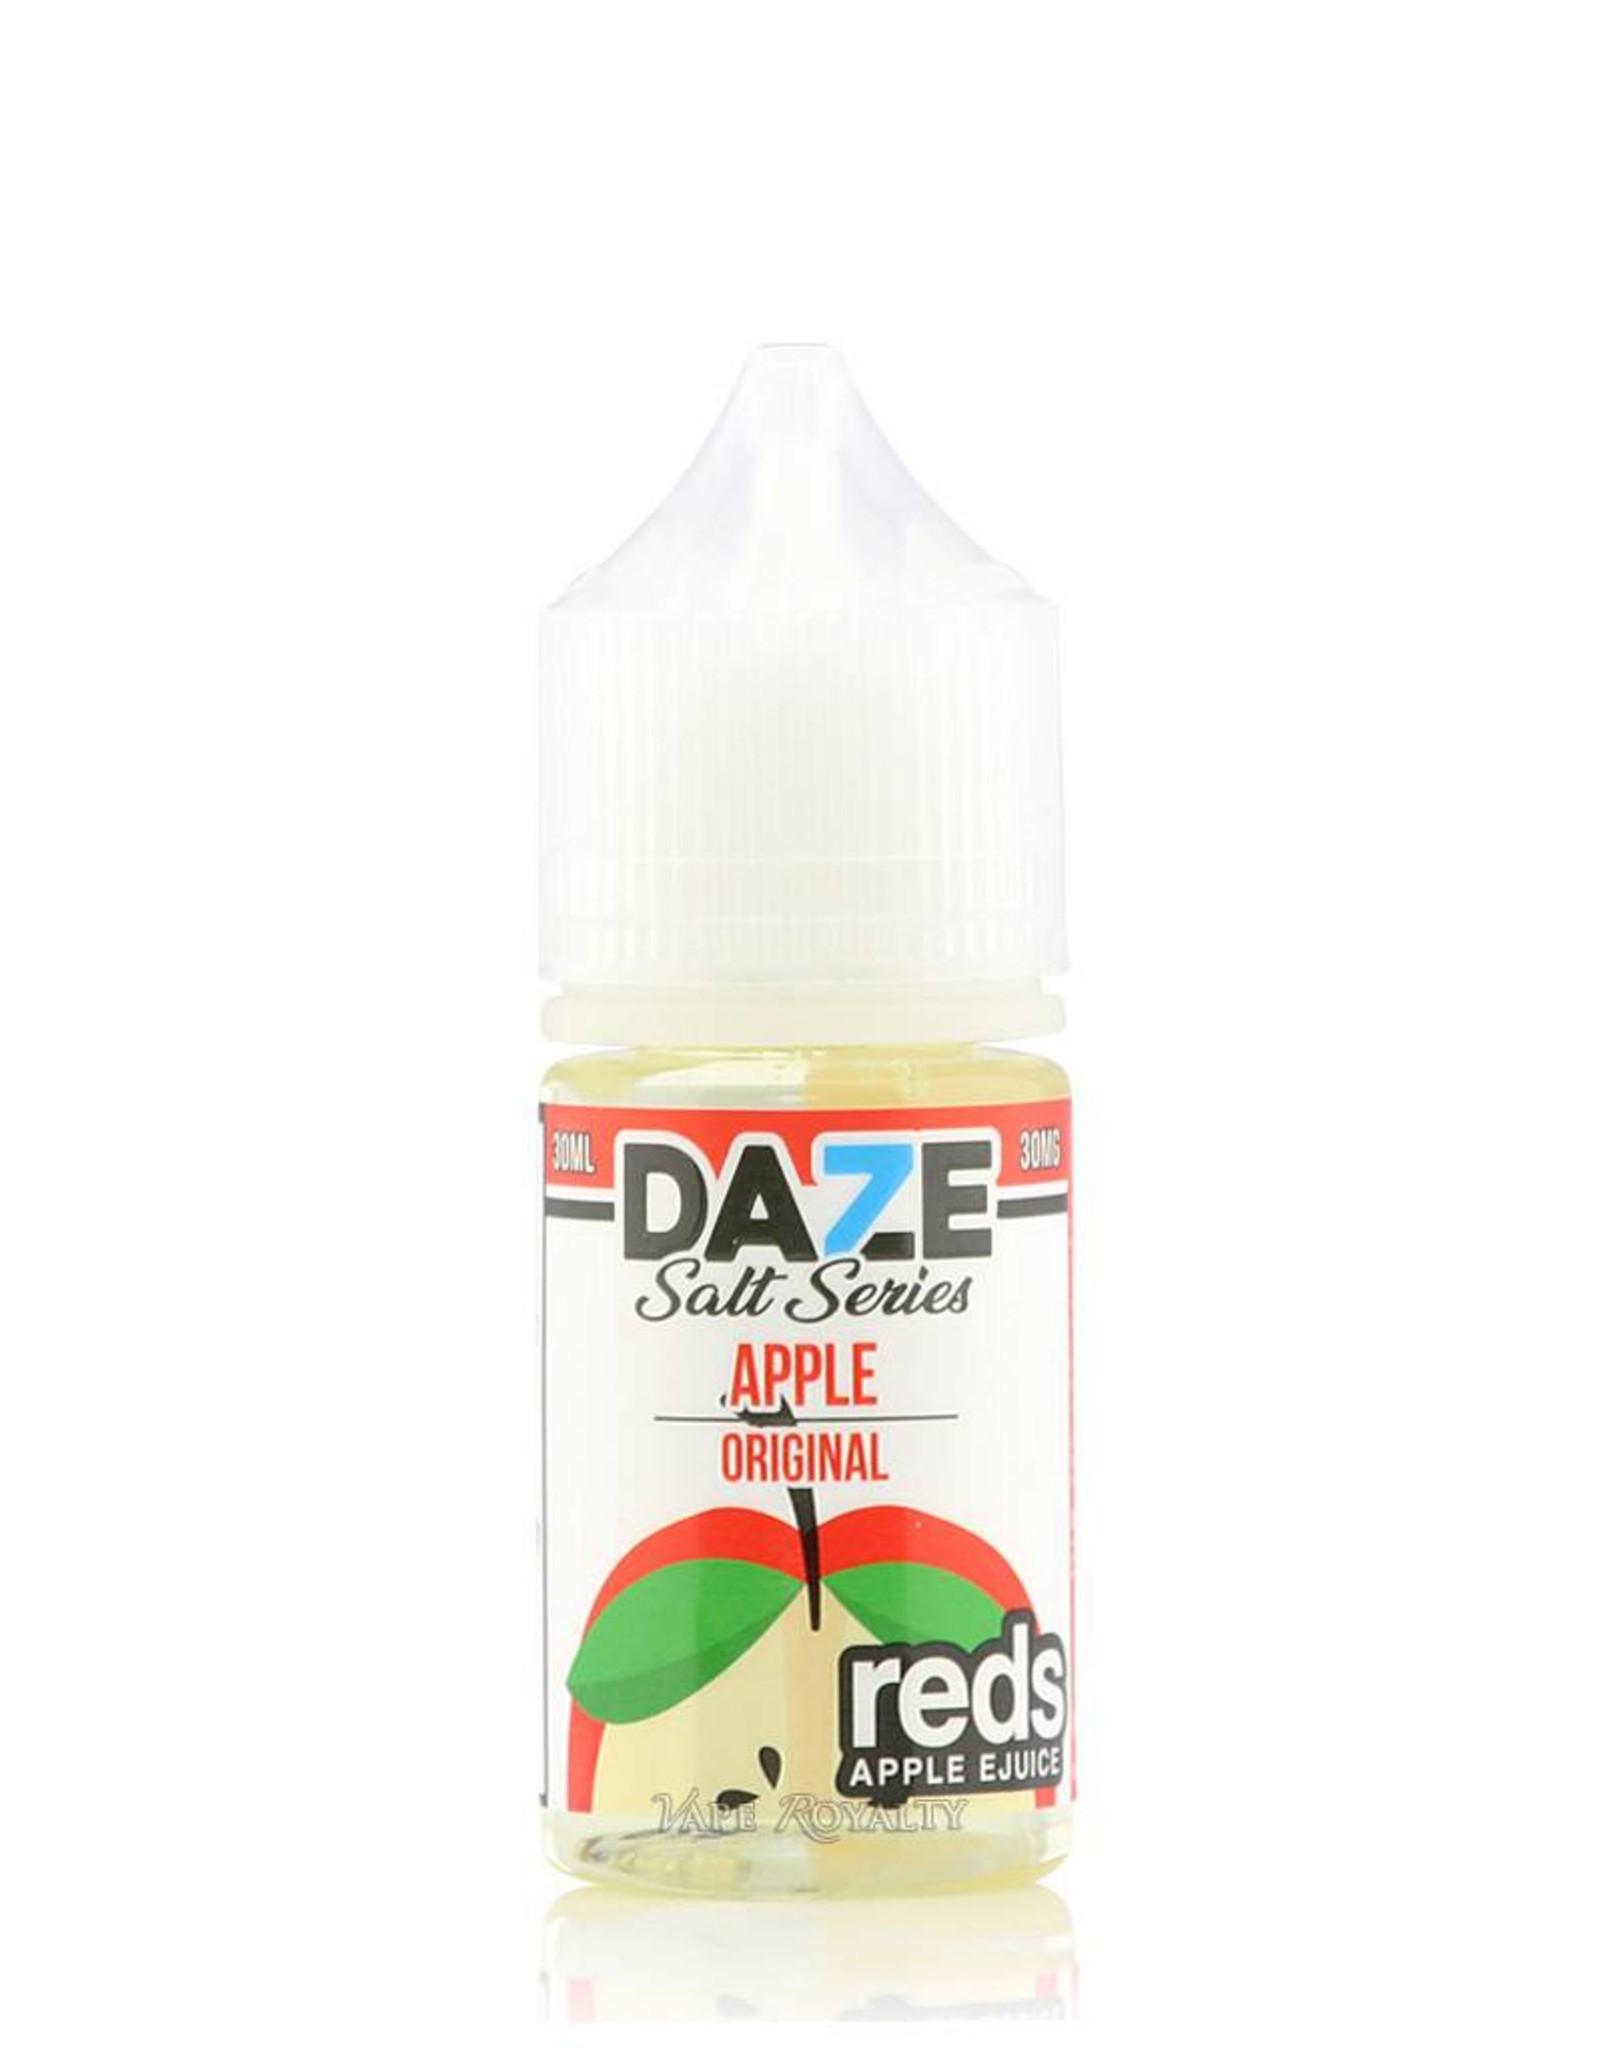 7 Daze - Salt Series Apple (30mL)